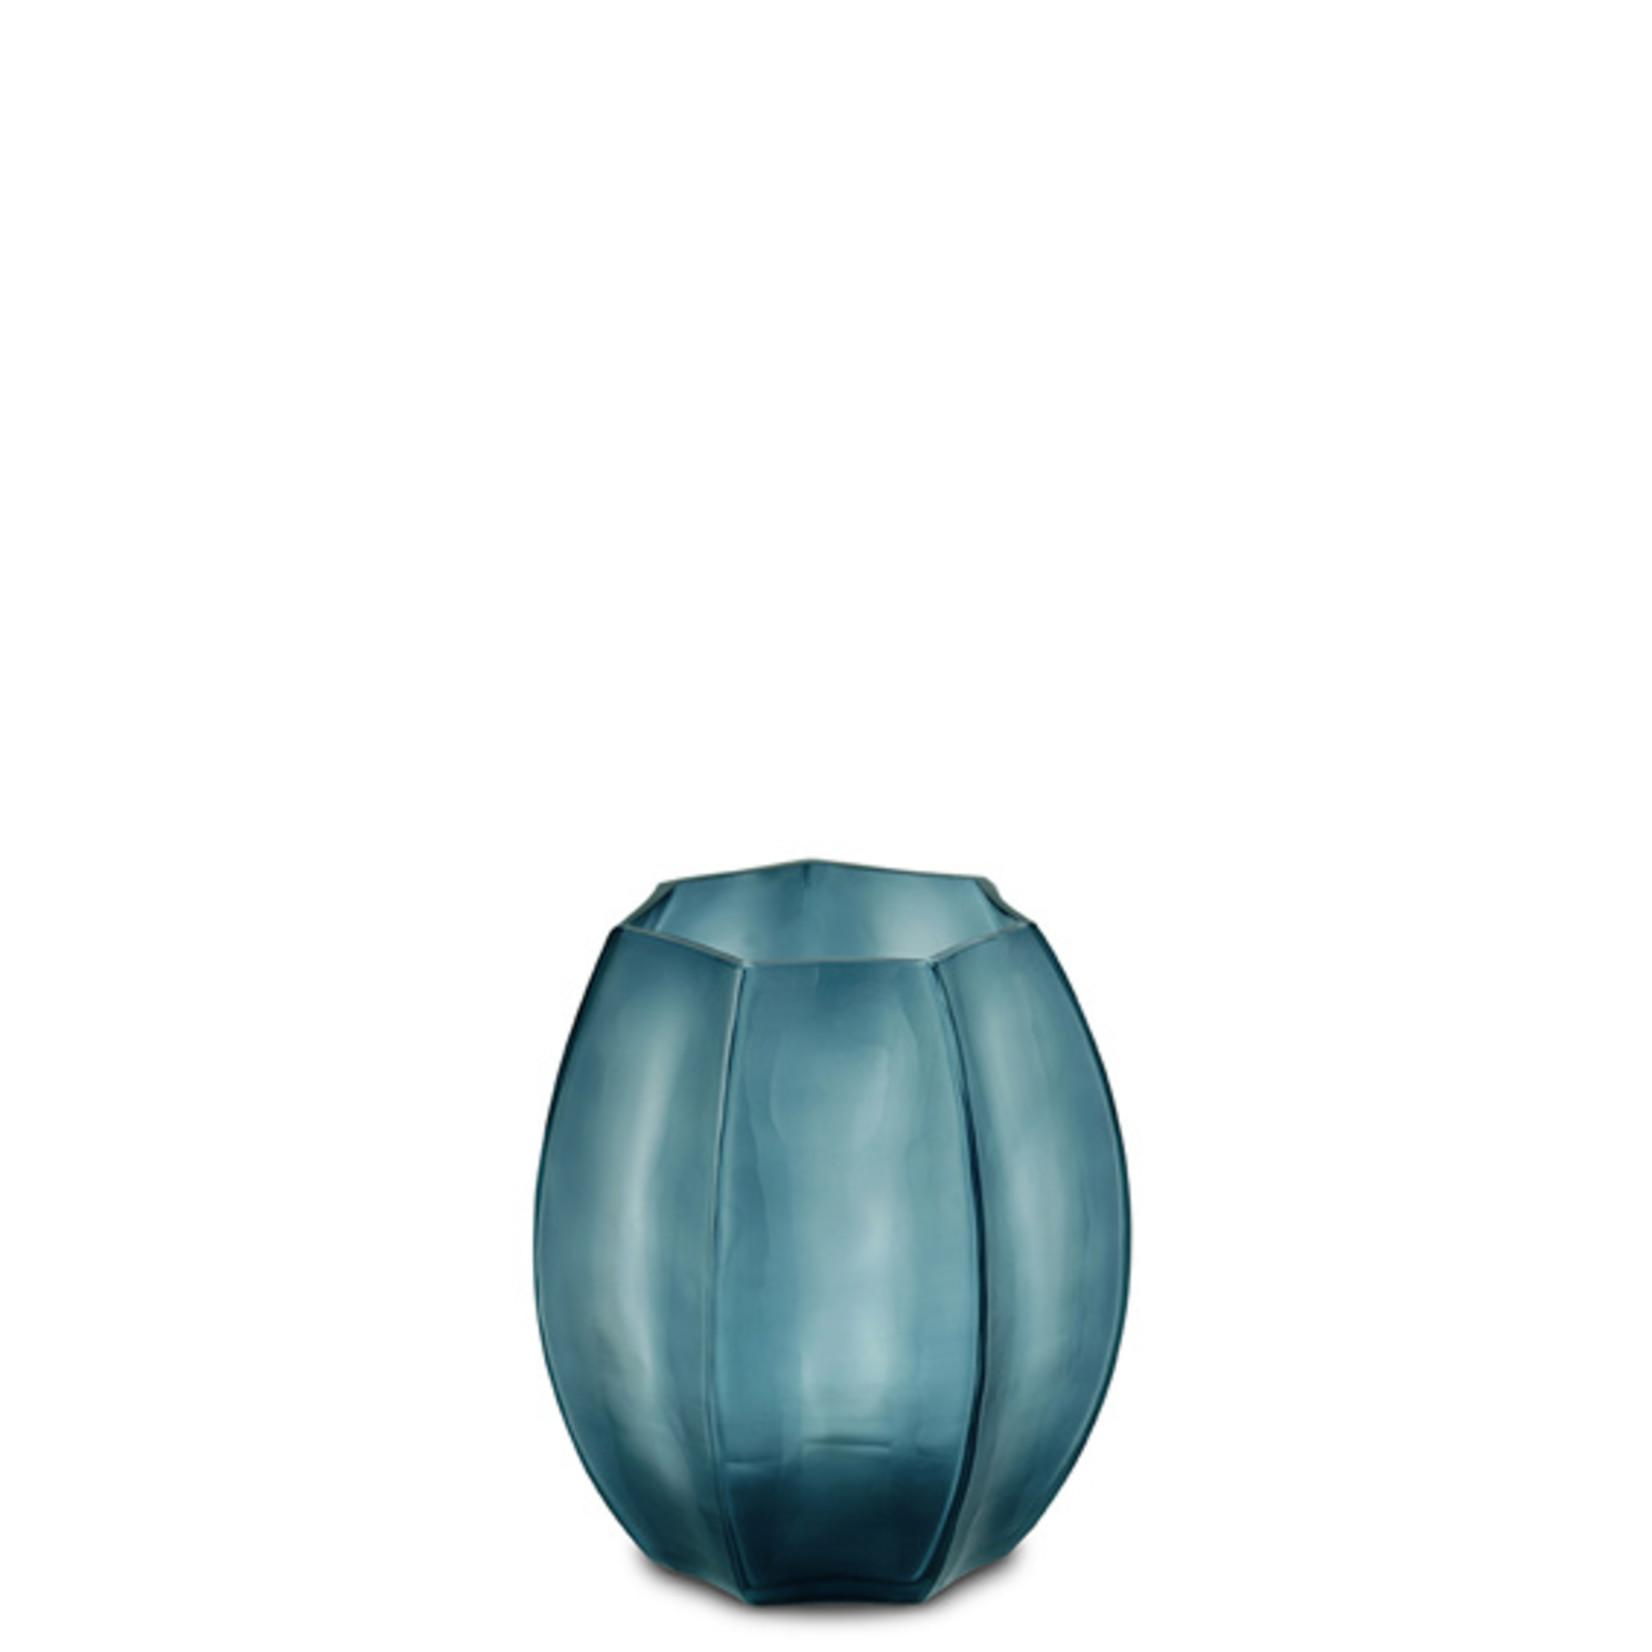 Guaxs Vaas Koonam S | Ocean Blue / Indigo